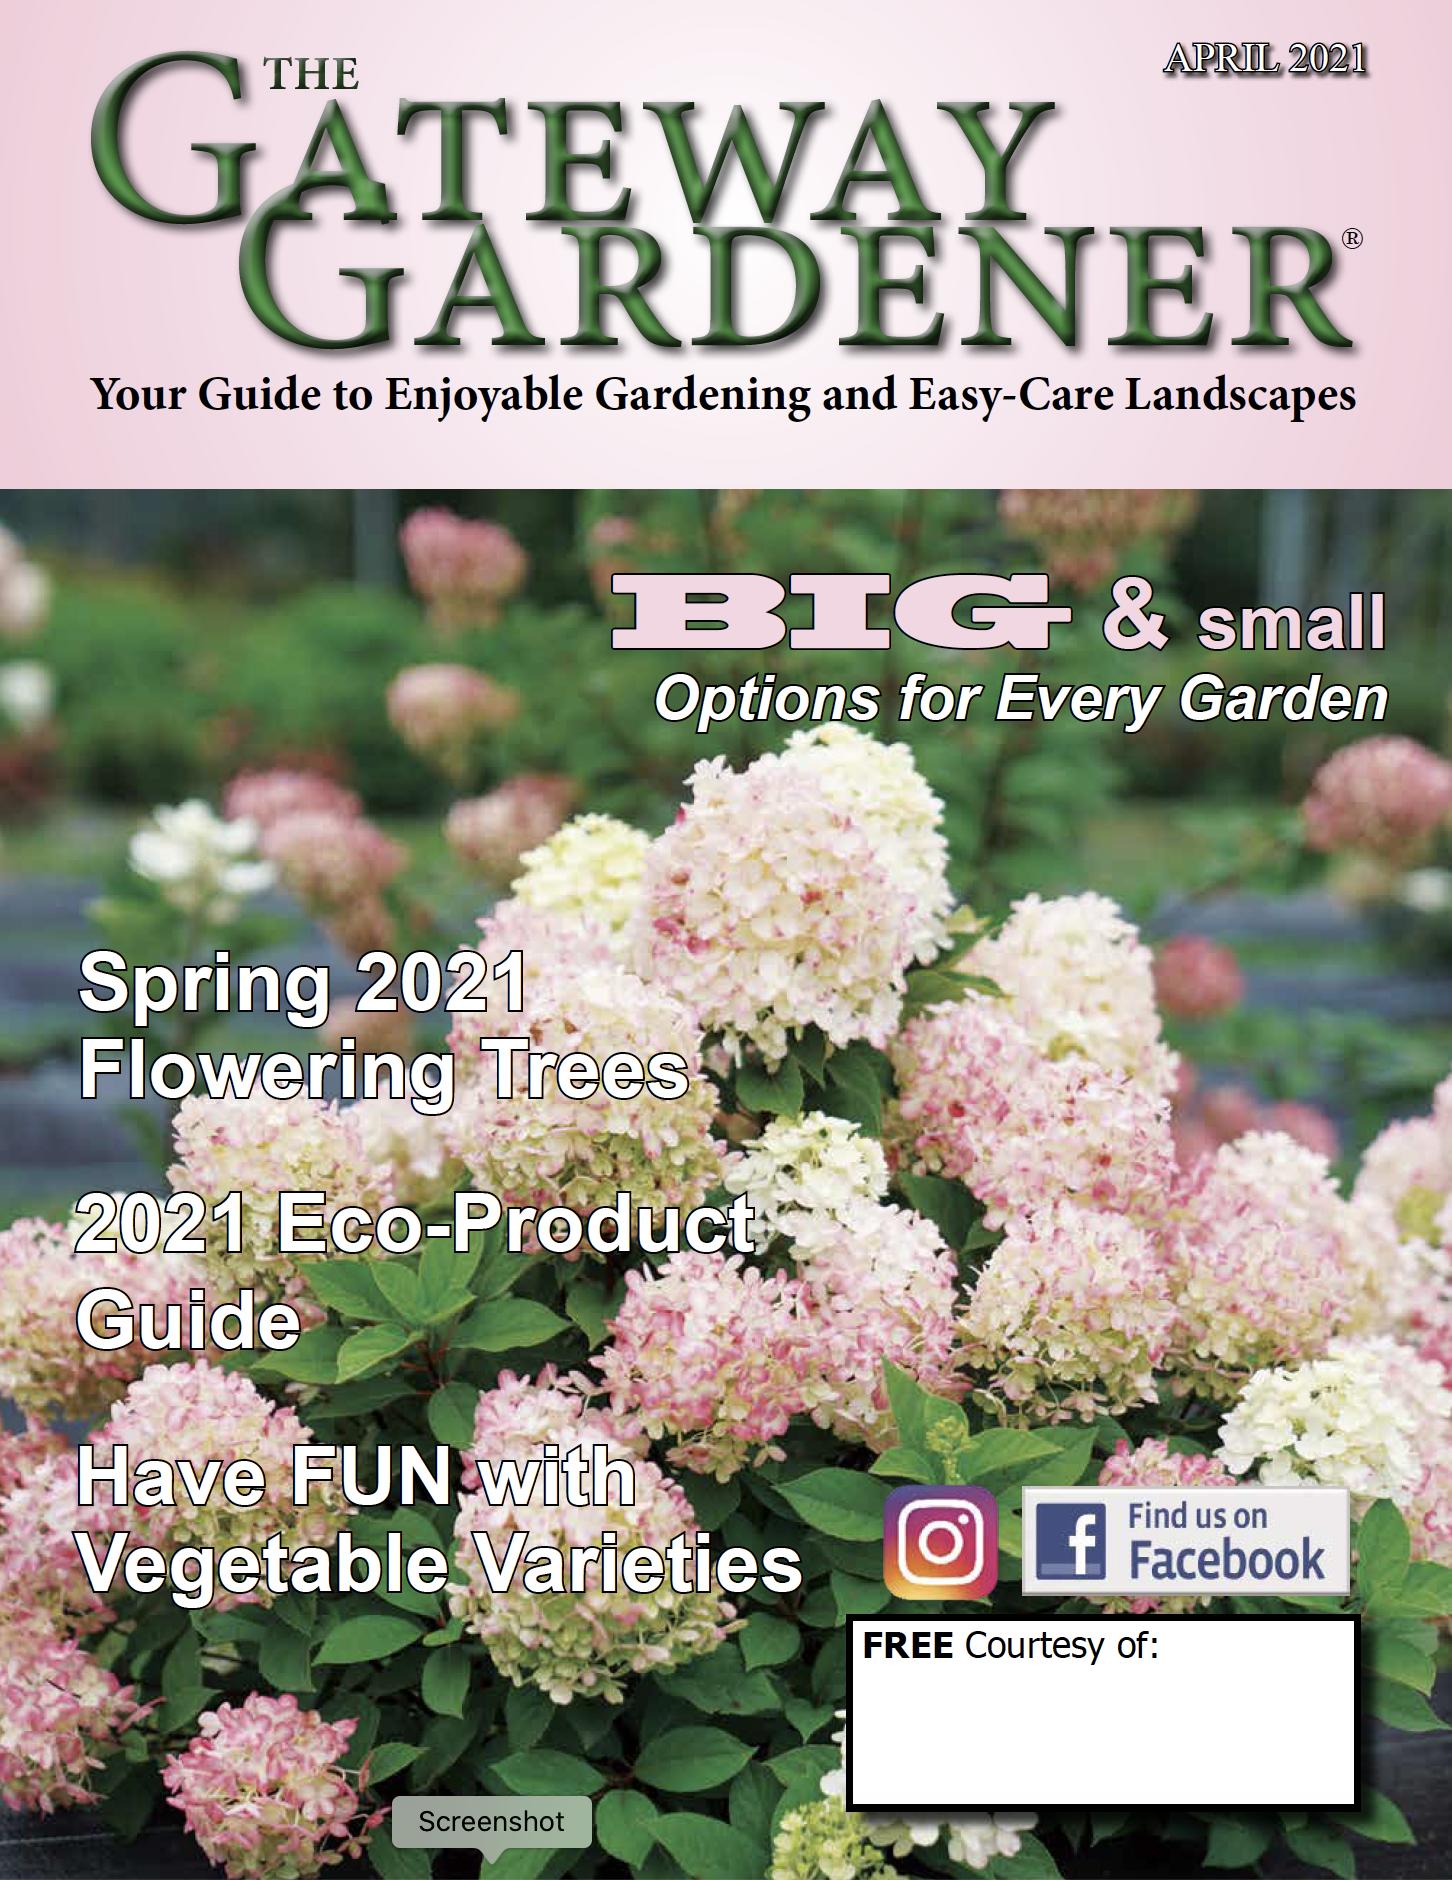 Gateway Gardener April 2021 cover image